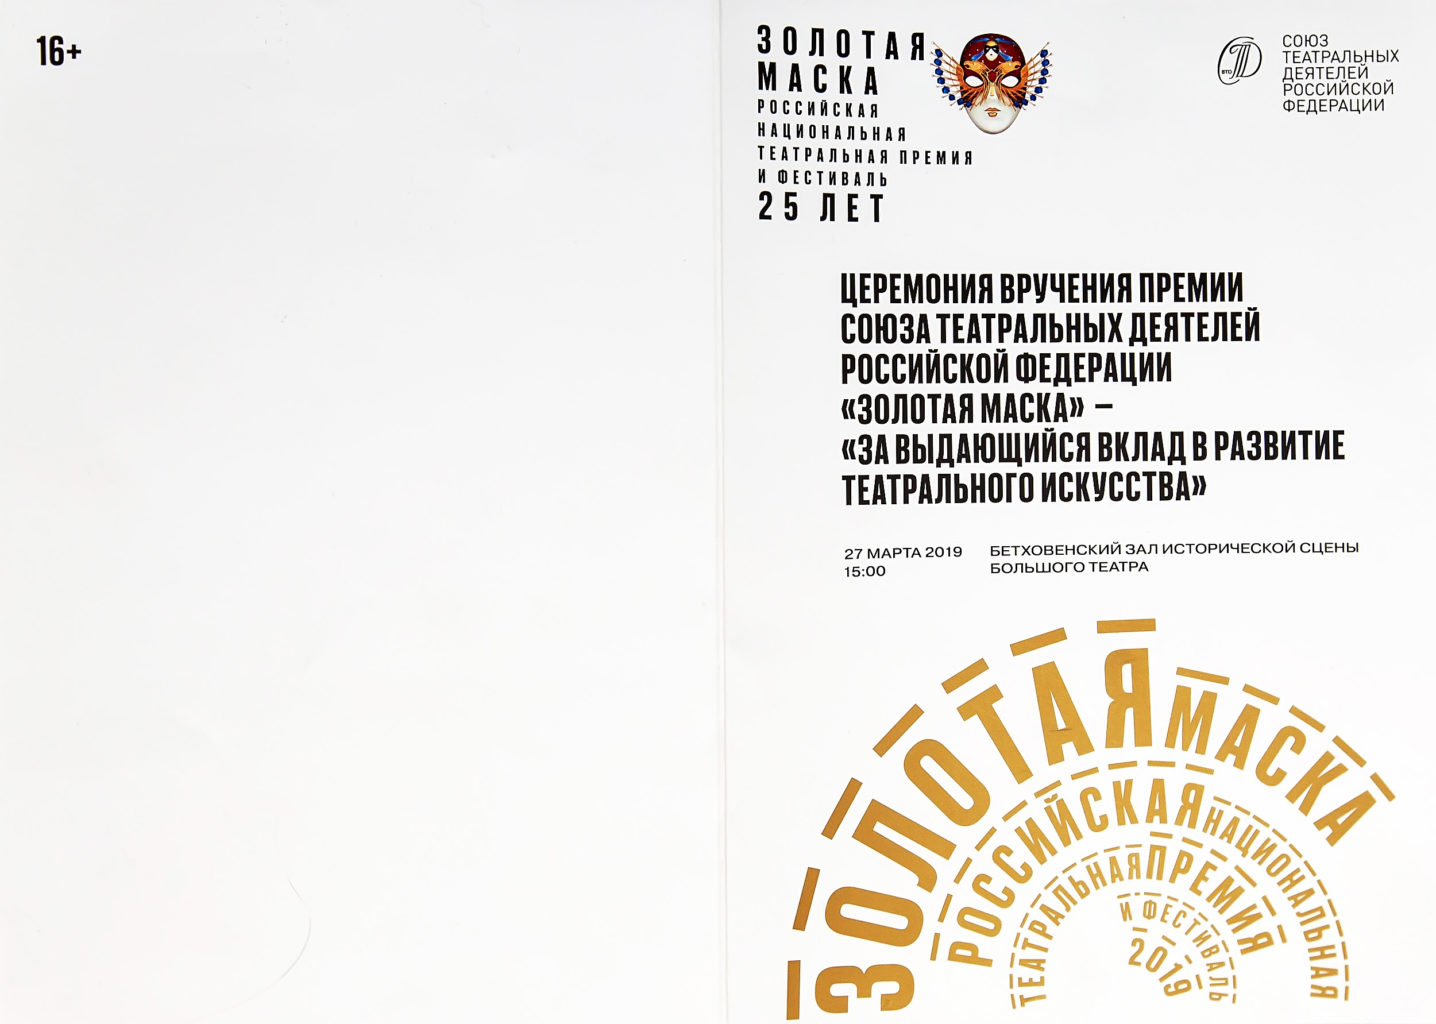 Церемония вручения премии «Золотая маска», сезон 2017-2018 гг.: программа